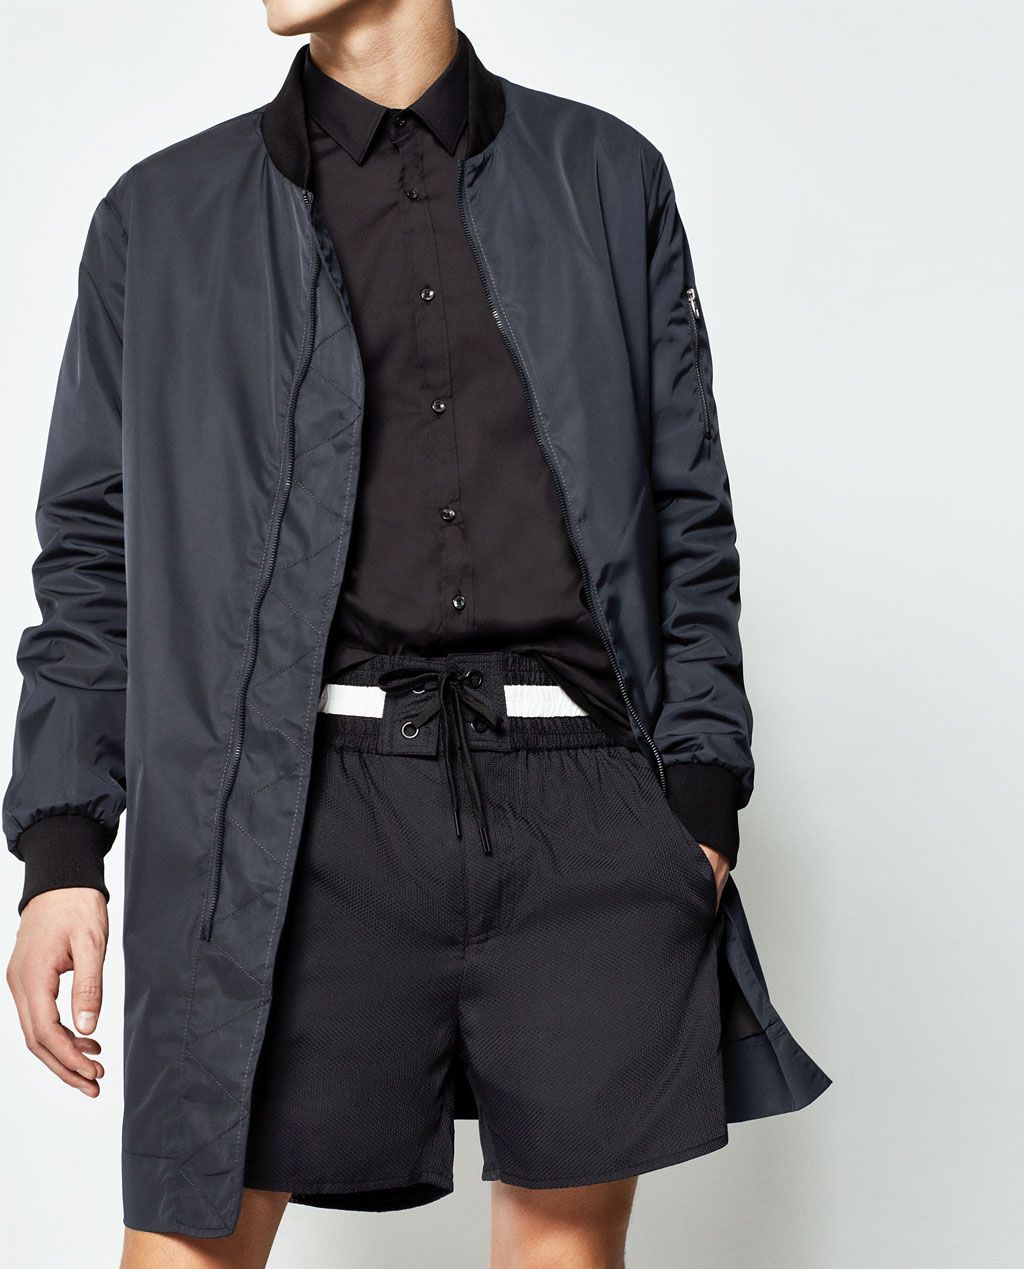 LONG BOMBER JACKET from Zara Long bomber jacket, Bomber